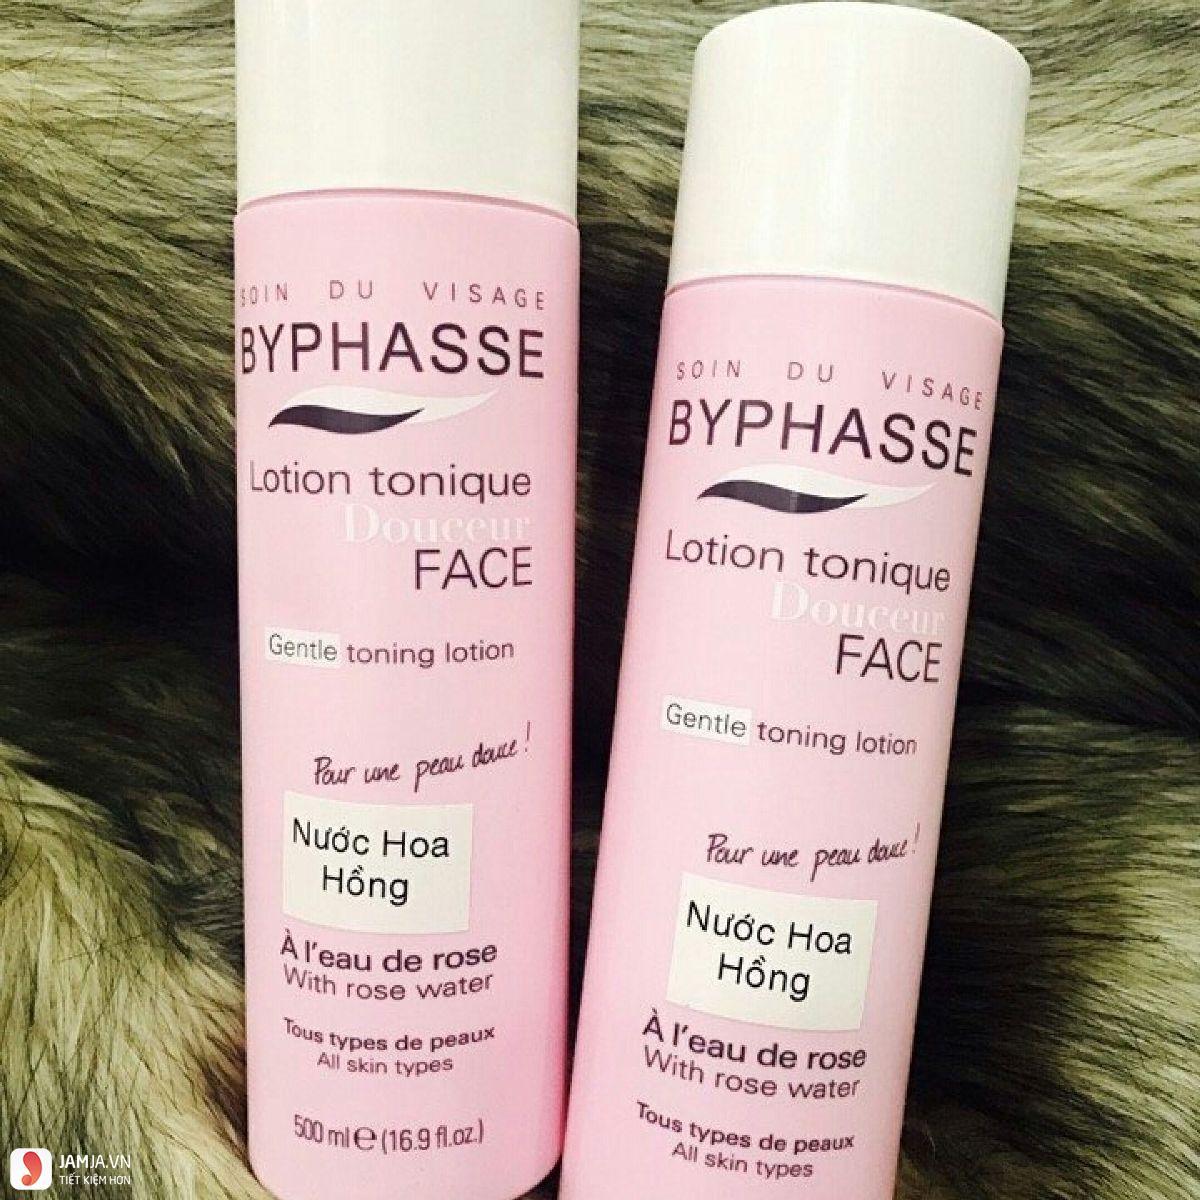 Nước hoa hồng Byphasse review chi tiết 1